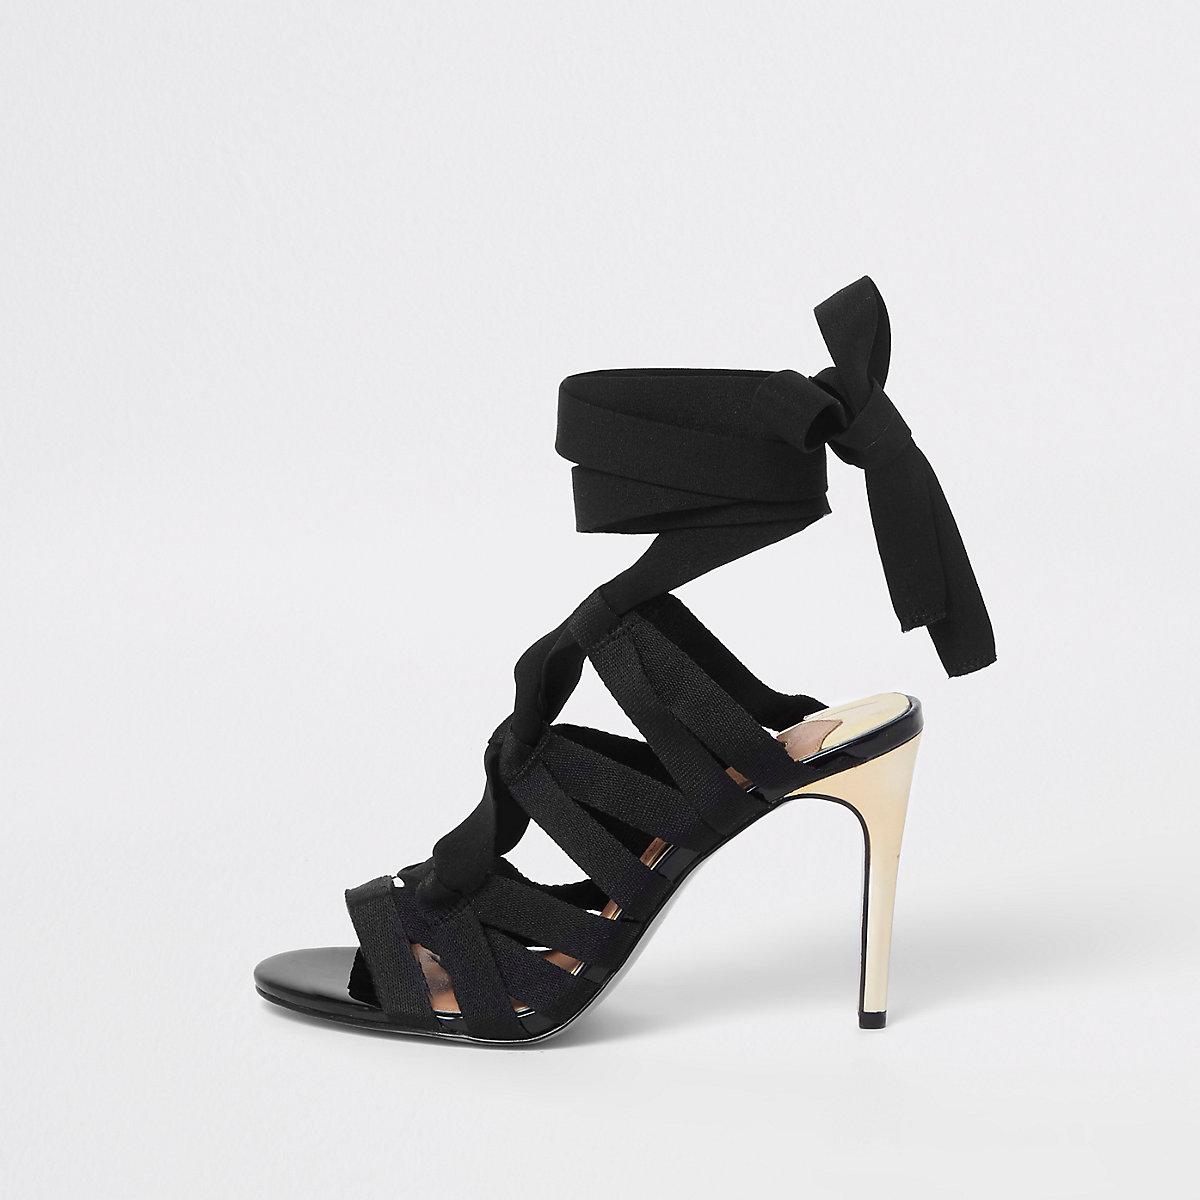 734c70f7ddc Black caged tie up sandals - Sandals - Shoes   Boots - women